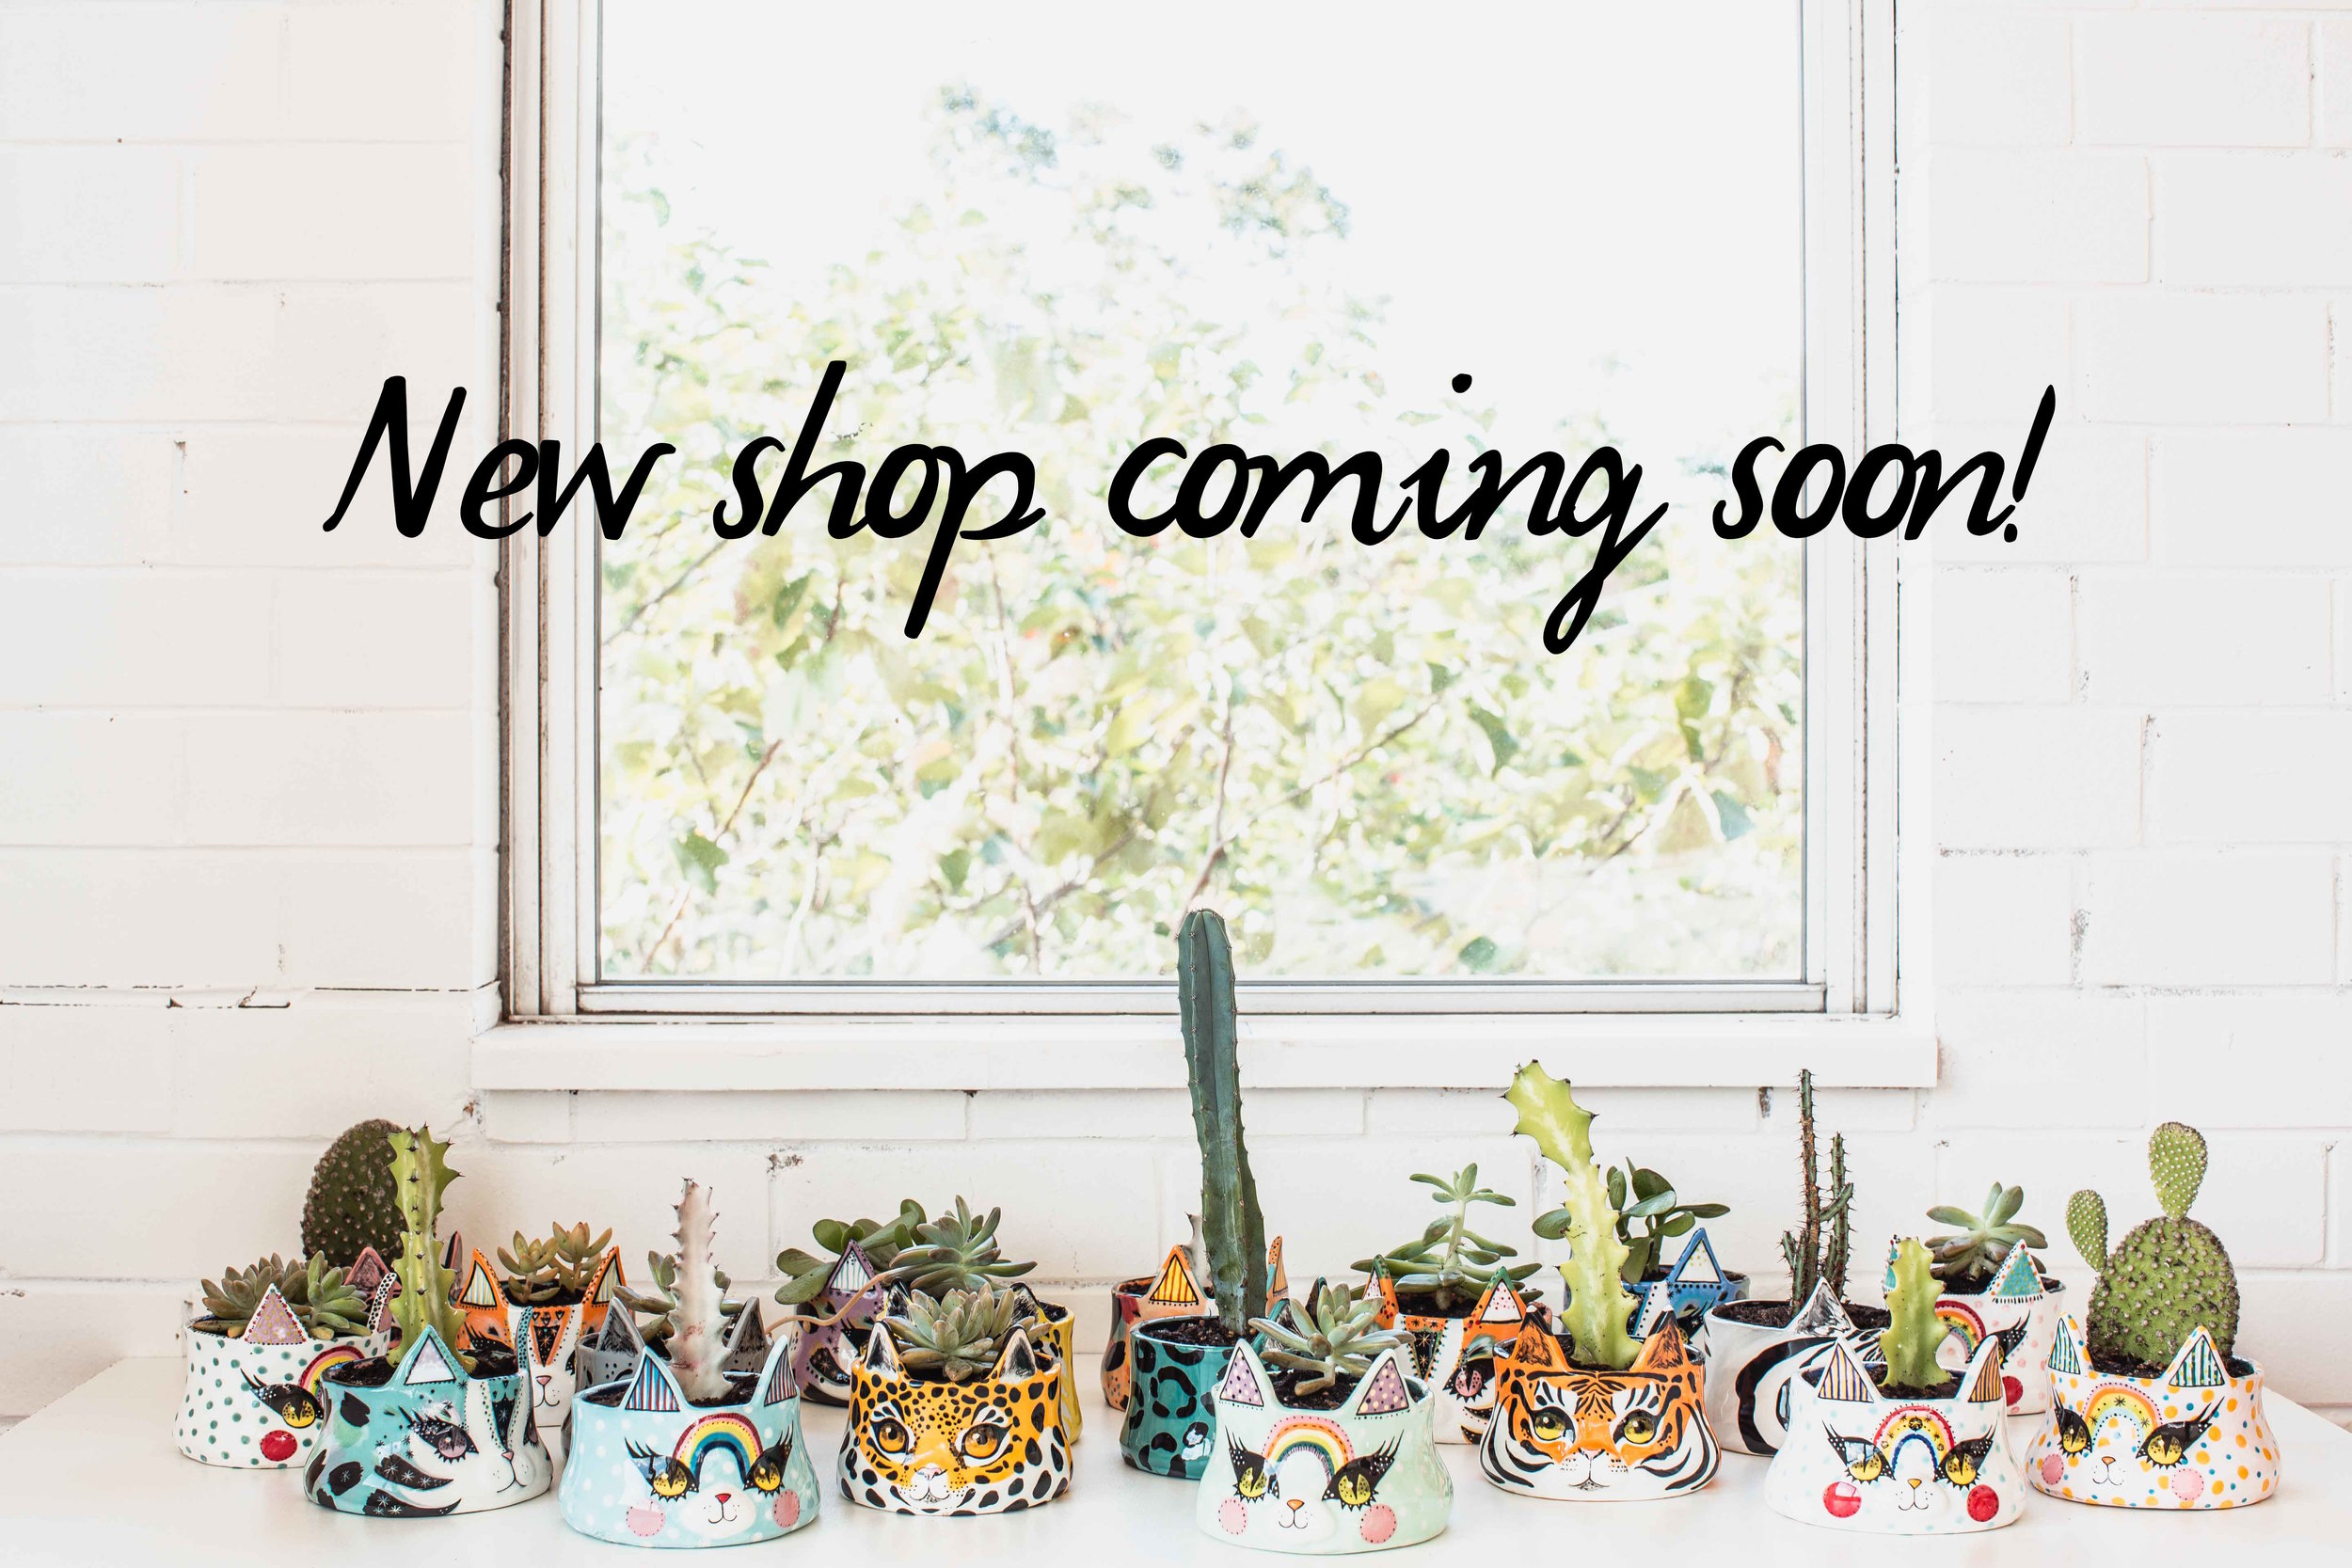 new shop coming soon.jpg